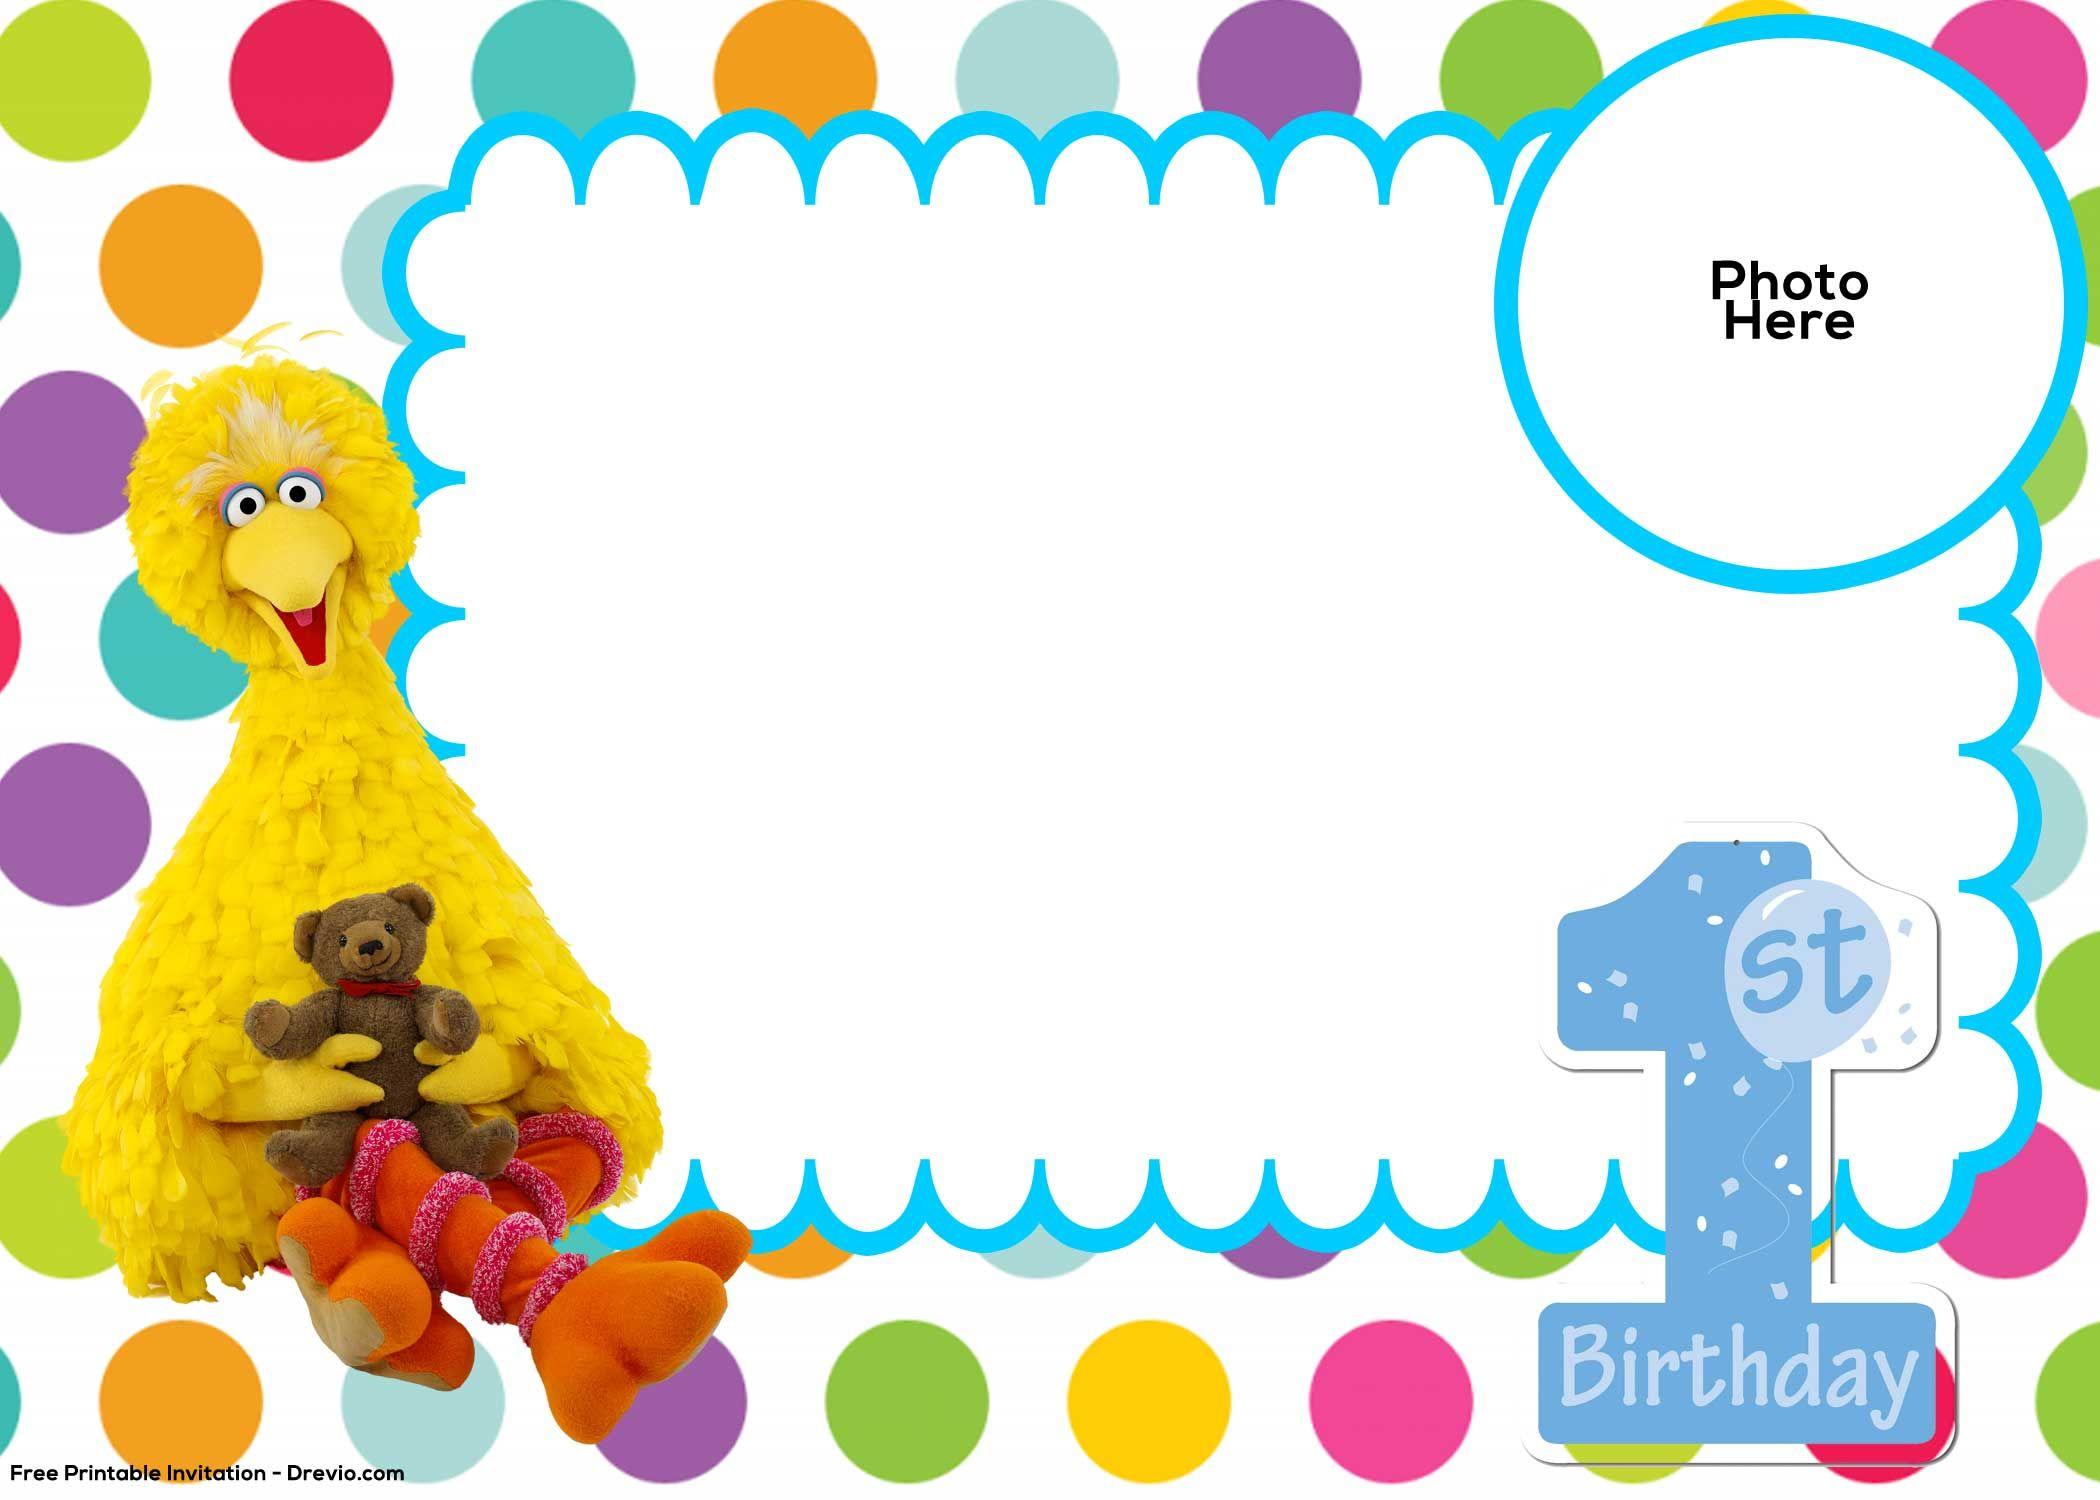 photo about 1st Birthday Free Printable Invitations called no cost printable 1st birthday invites templates - Elim